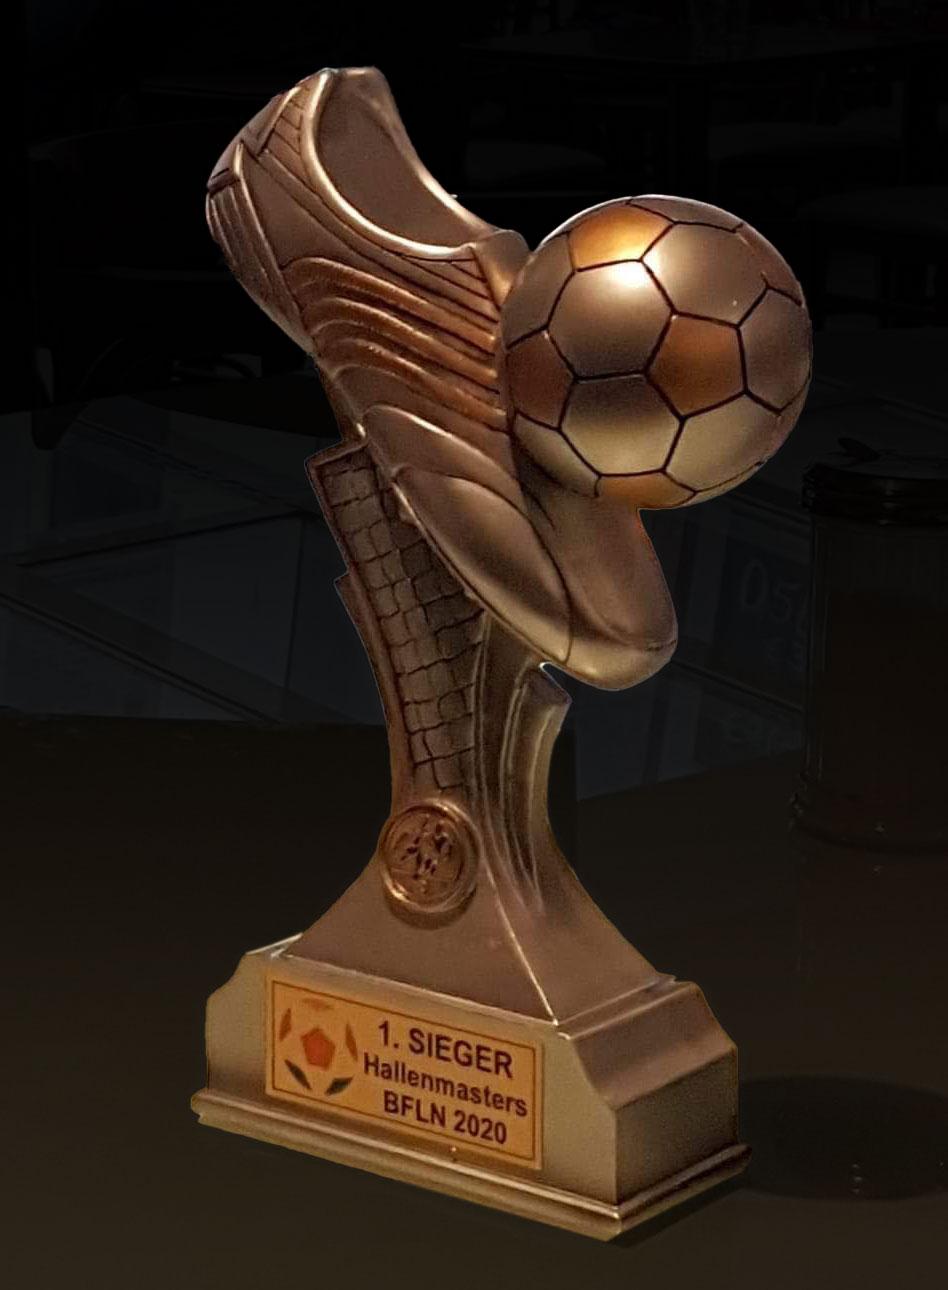 BFLN-Hallenmasters-2020-Pokal